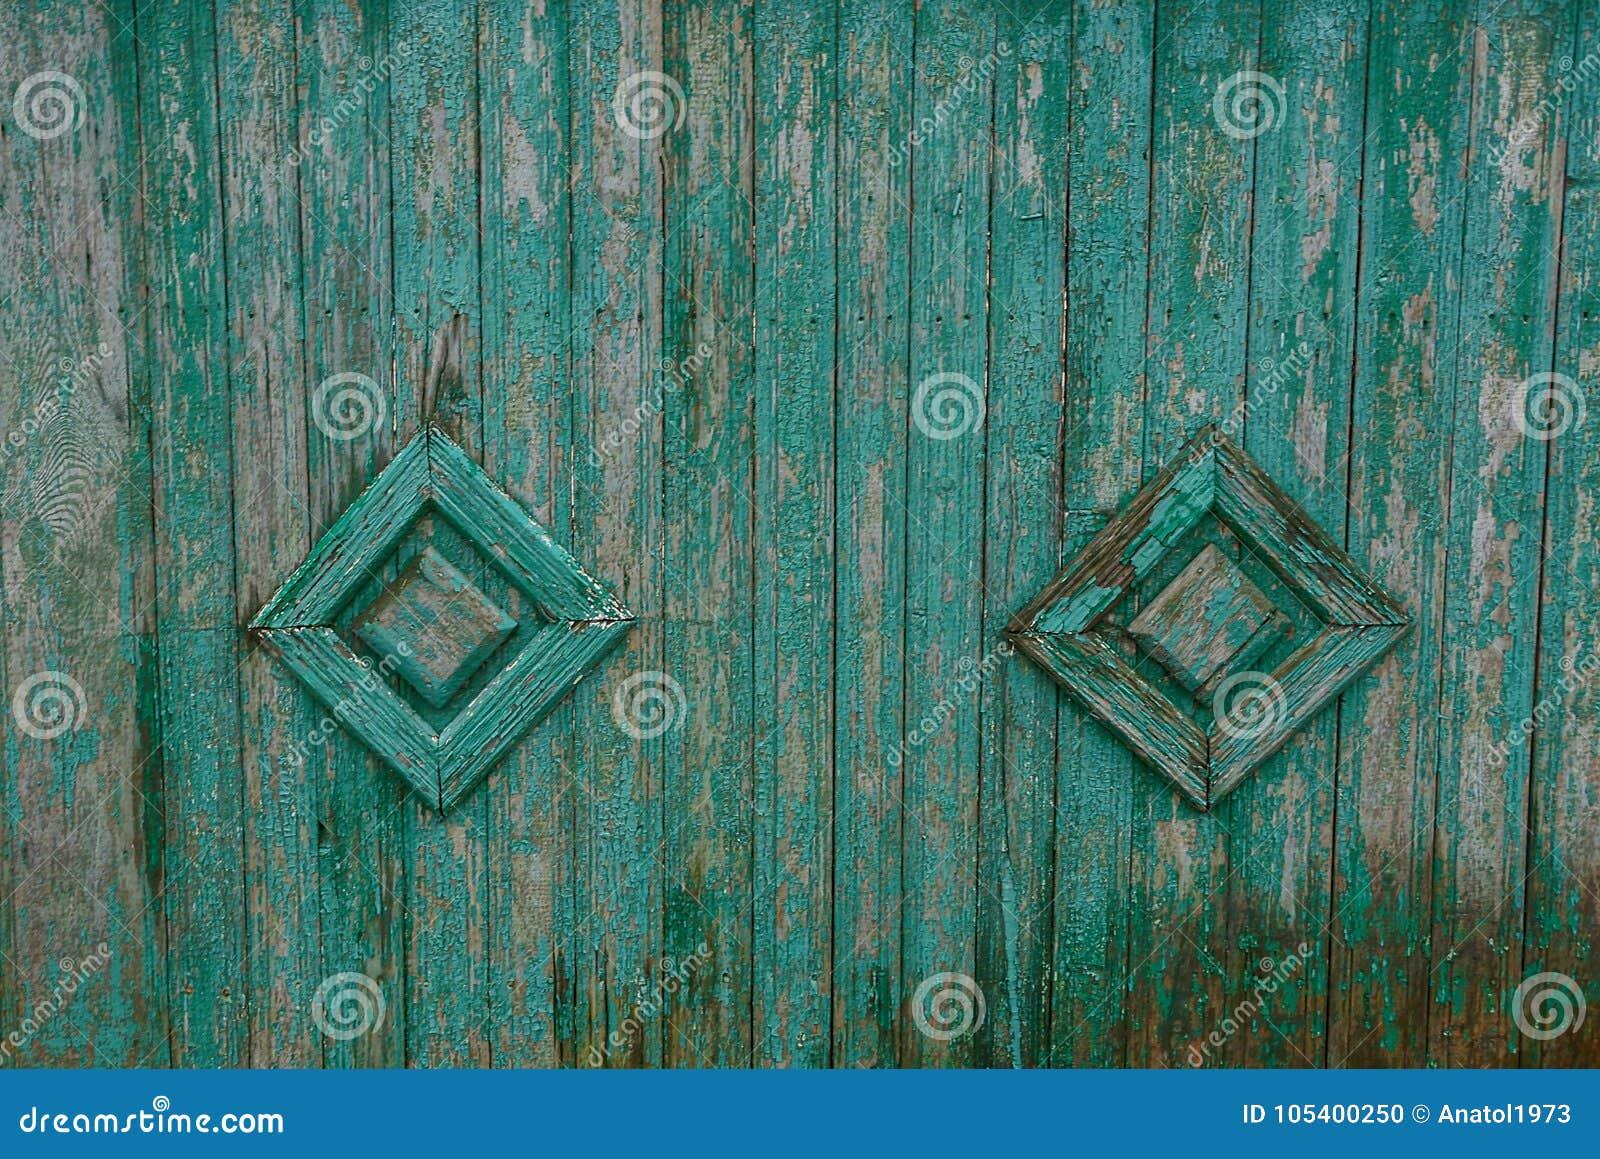 Download Γκρίζα πράσινη ξύλινη σύσταση των υγρών πινάκων φρακτών με το σχέδιο Στοκ Εικόνες - εικόνα από παλαιός, χρώμα: 105400250